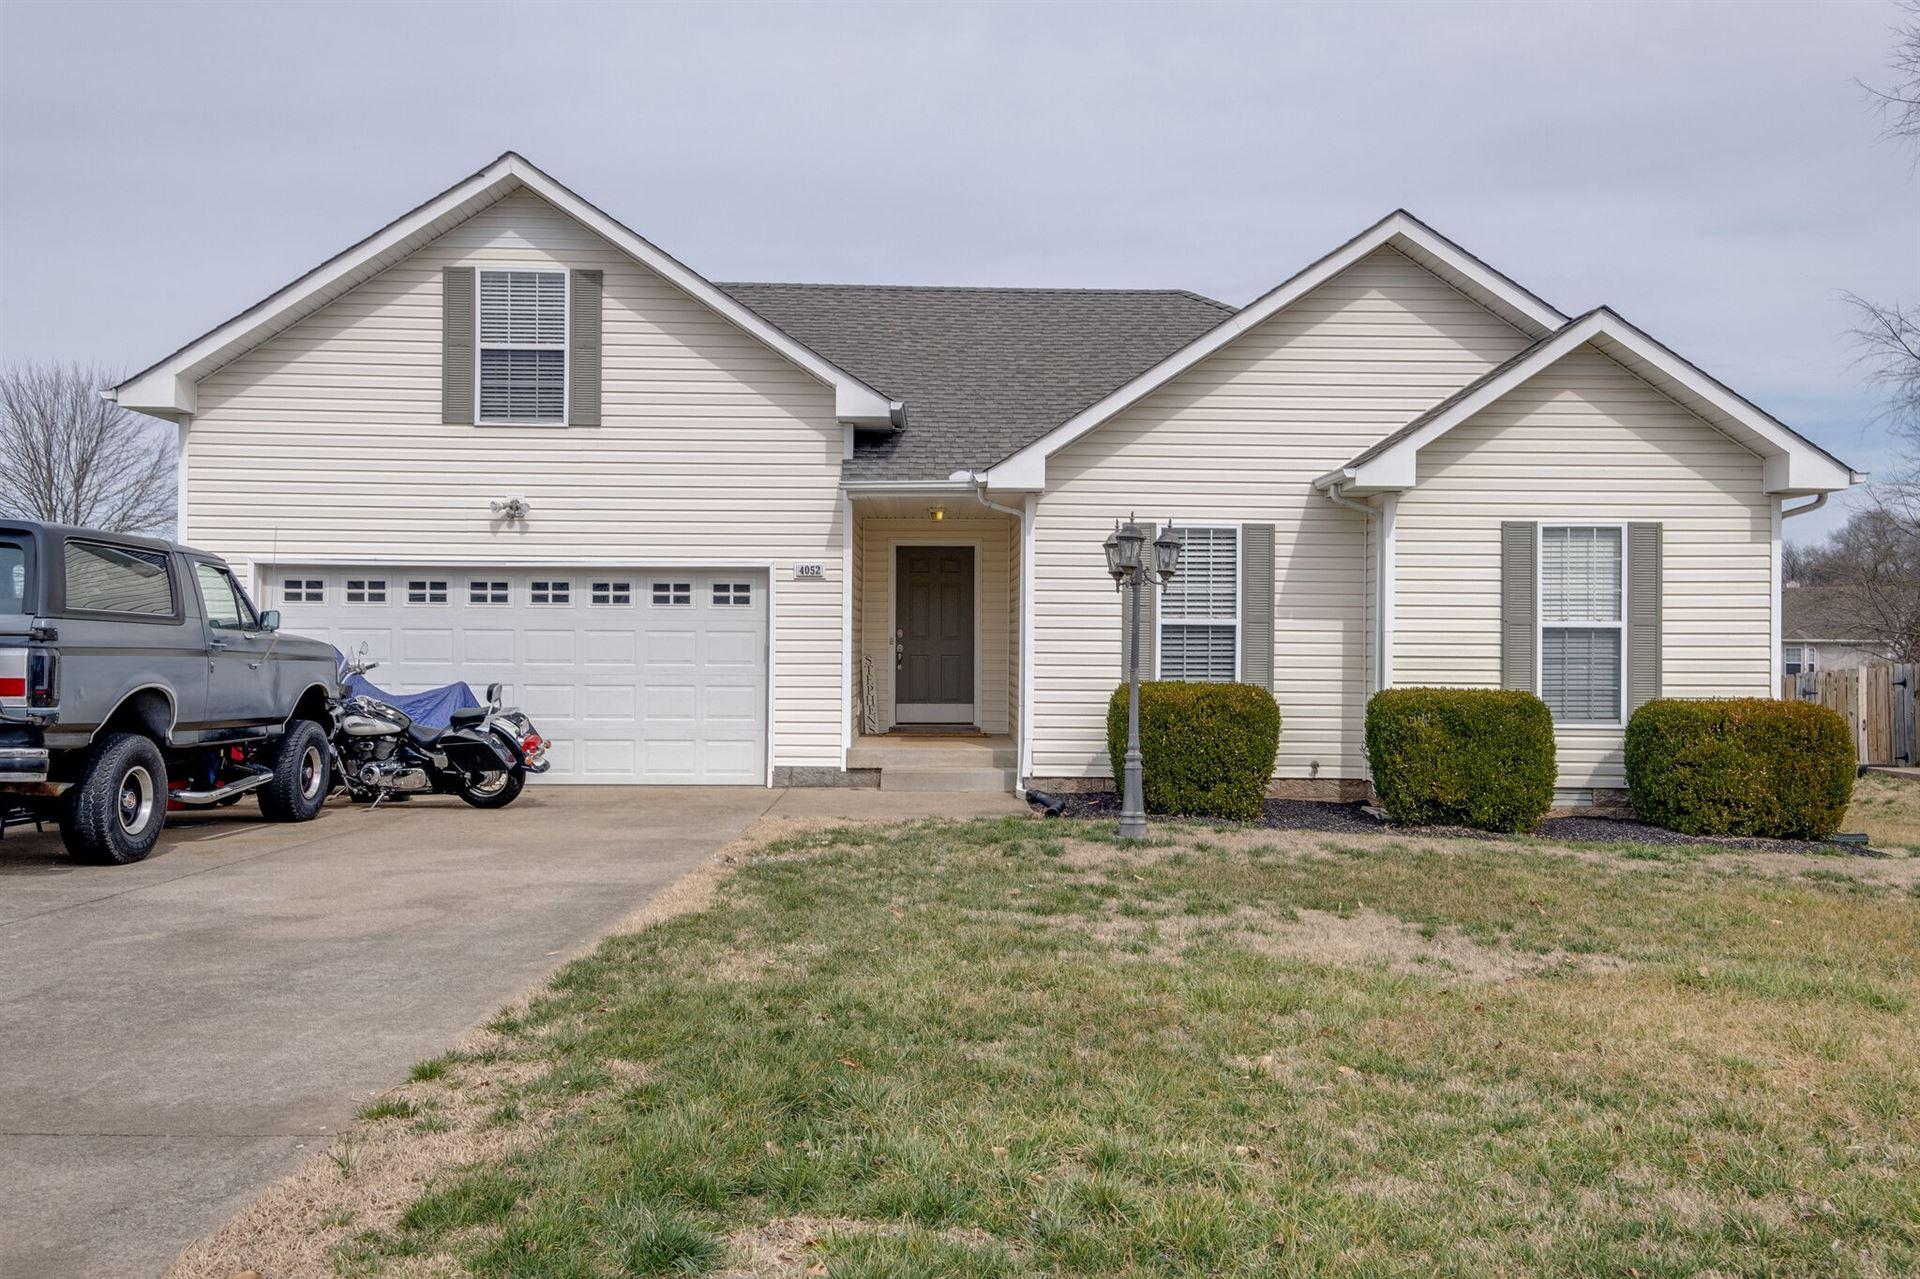 4052 New Grange Cir, Clarksville, TN 37040 - MLS#: 2233728